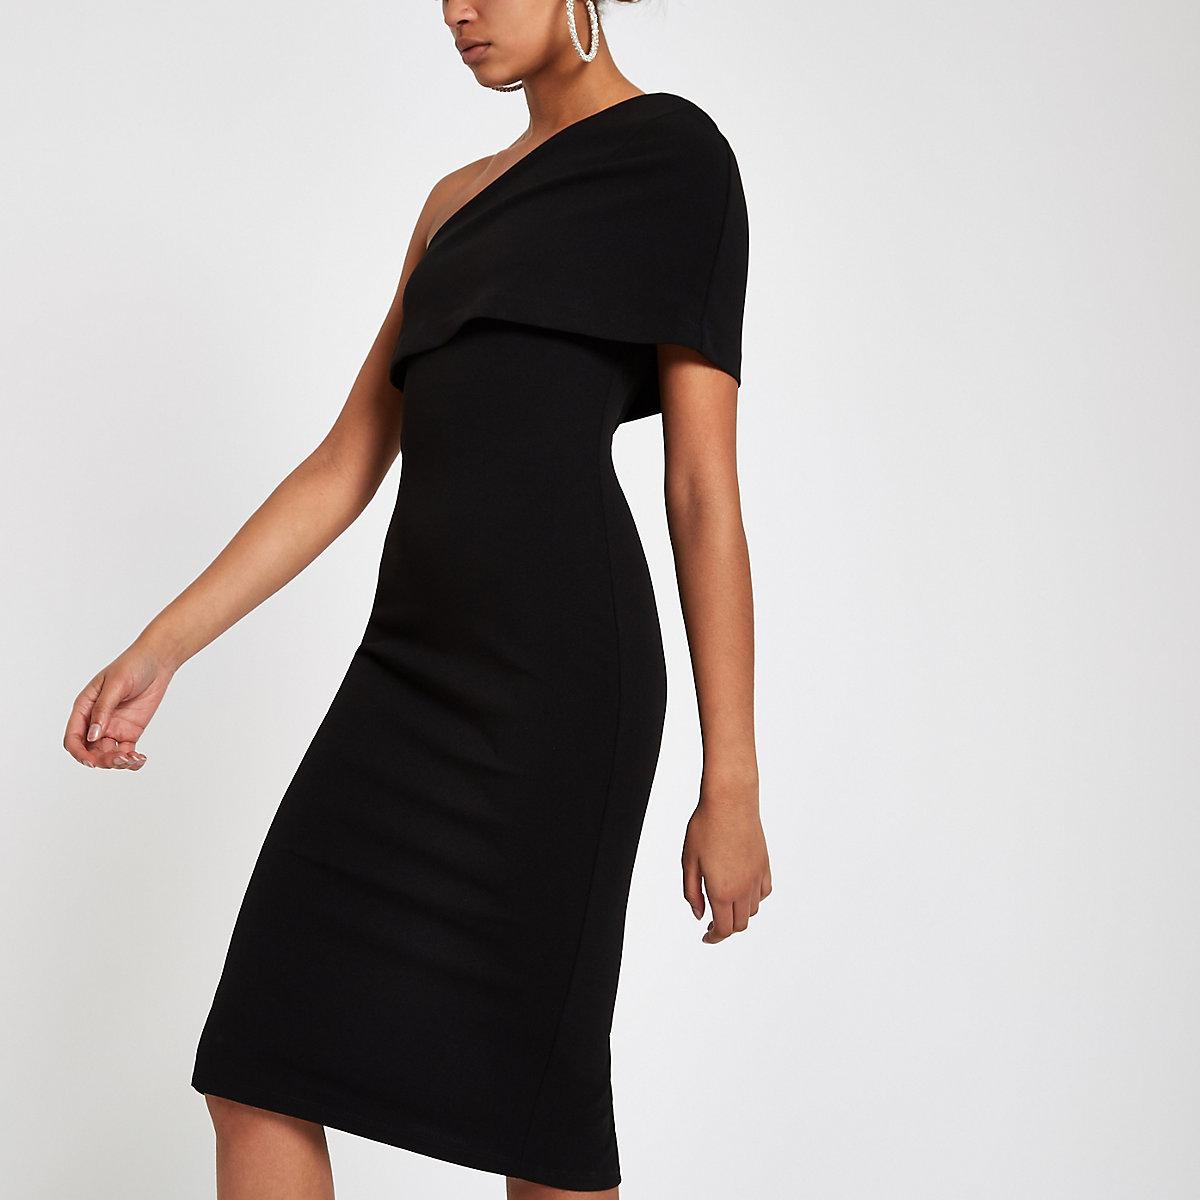 Black one shoulder cape bodycon dress